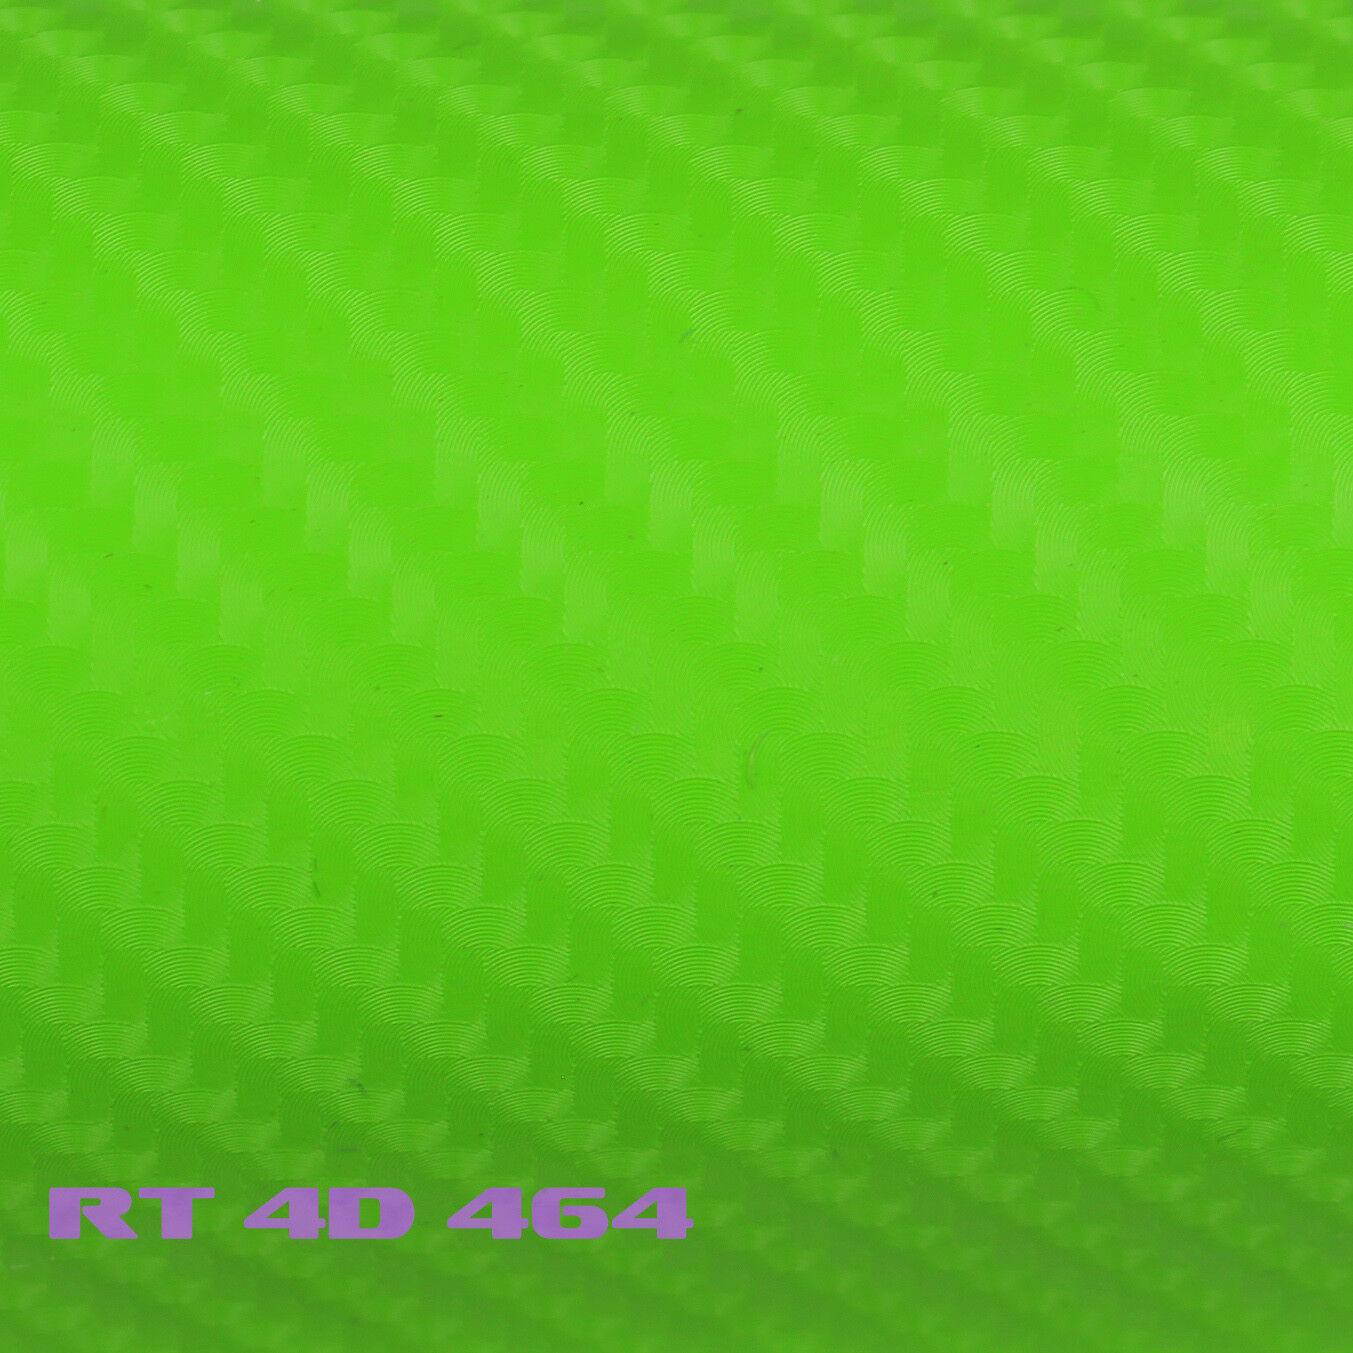 ( m²) Premium 4d CARBON PELLICOLA AUTO AUTO AUTO LUCENTEZZA ologramma canale aria Wrap 3d FLEX 0d323e